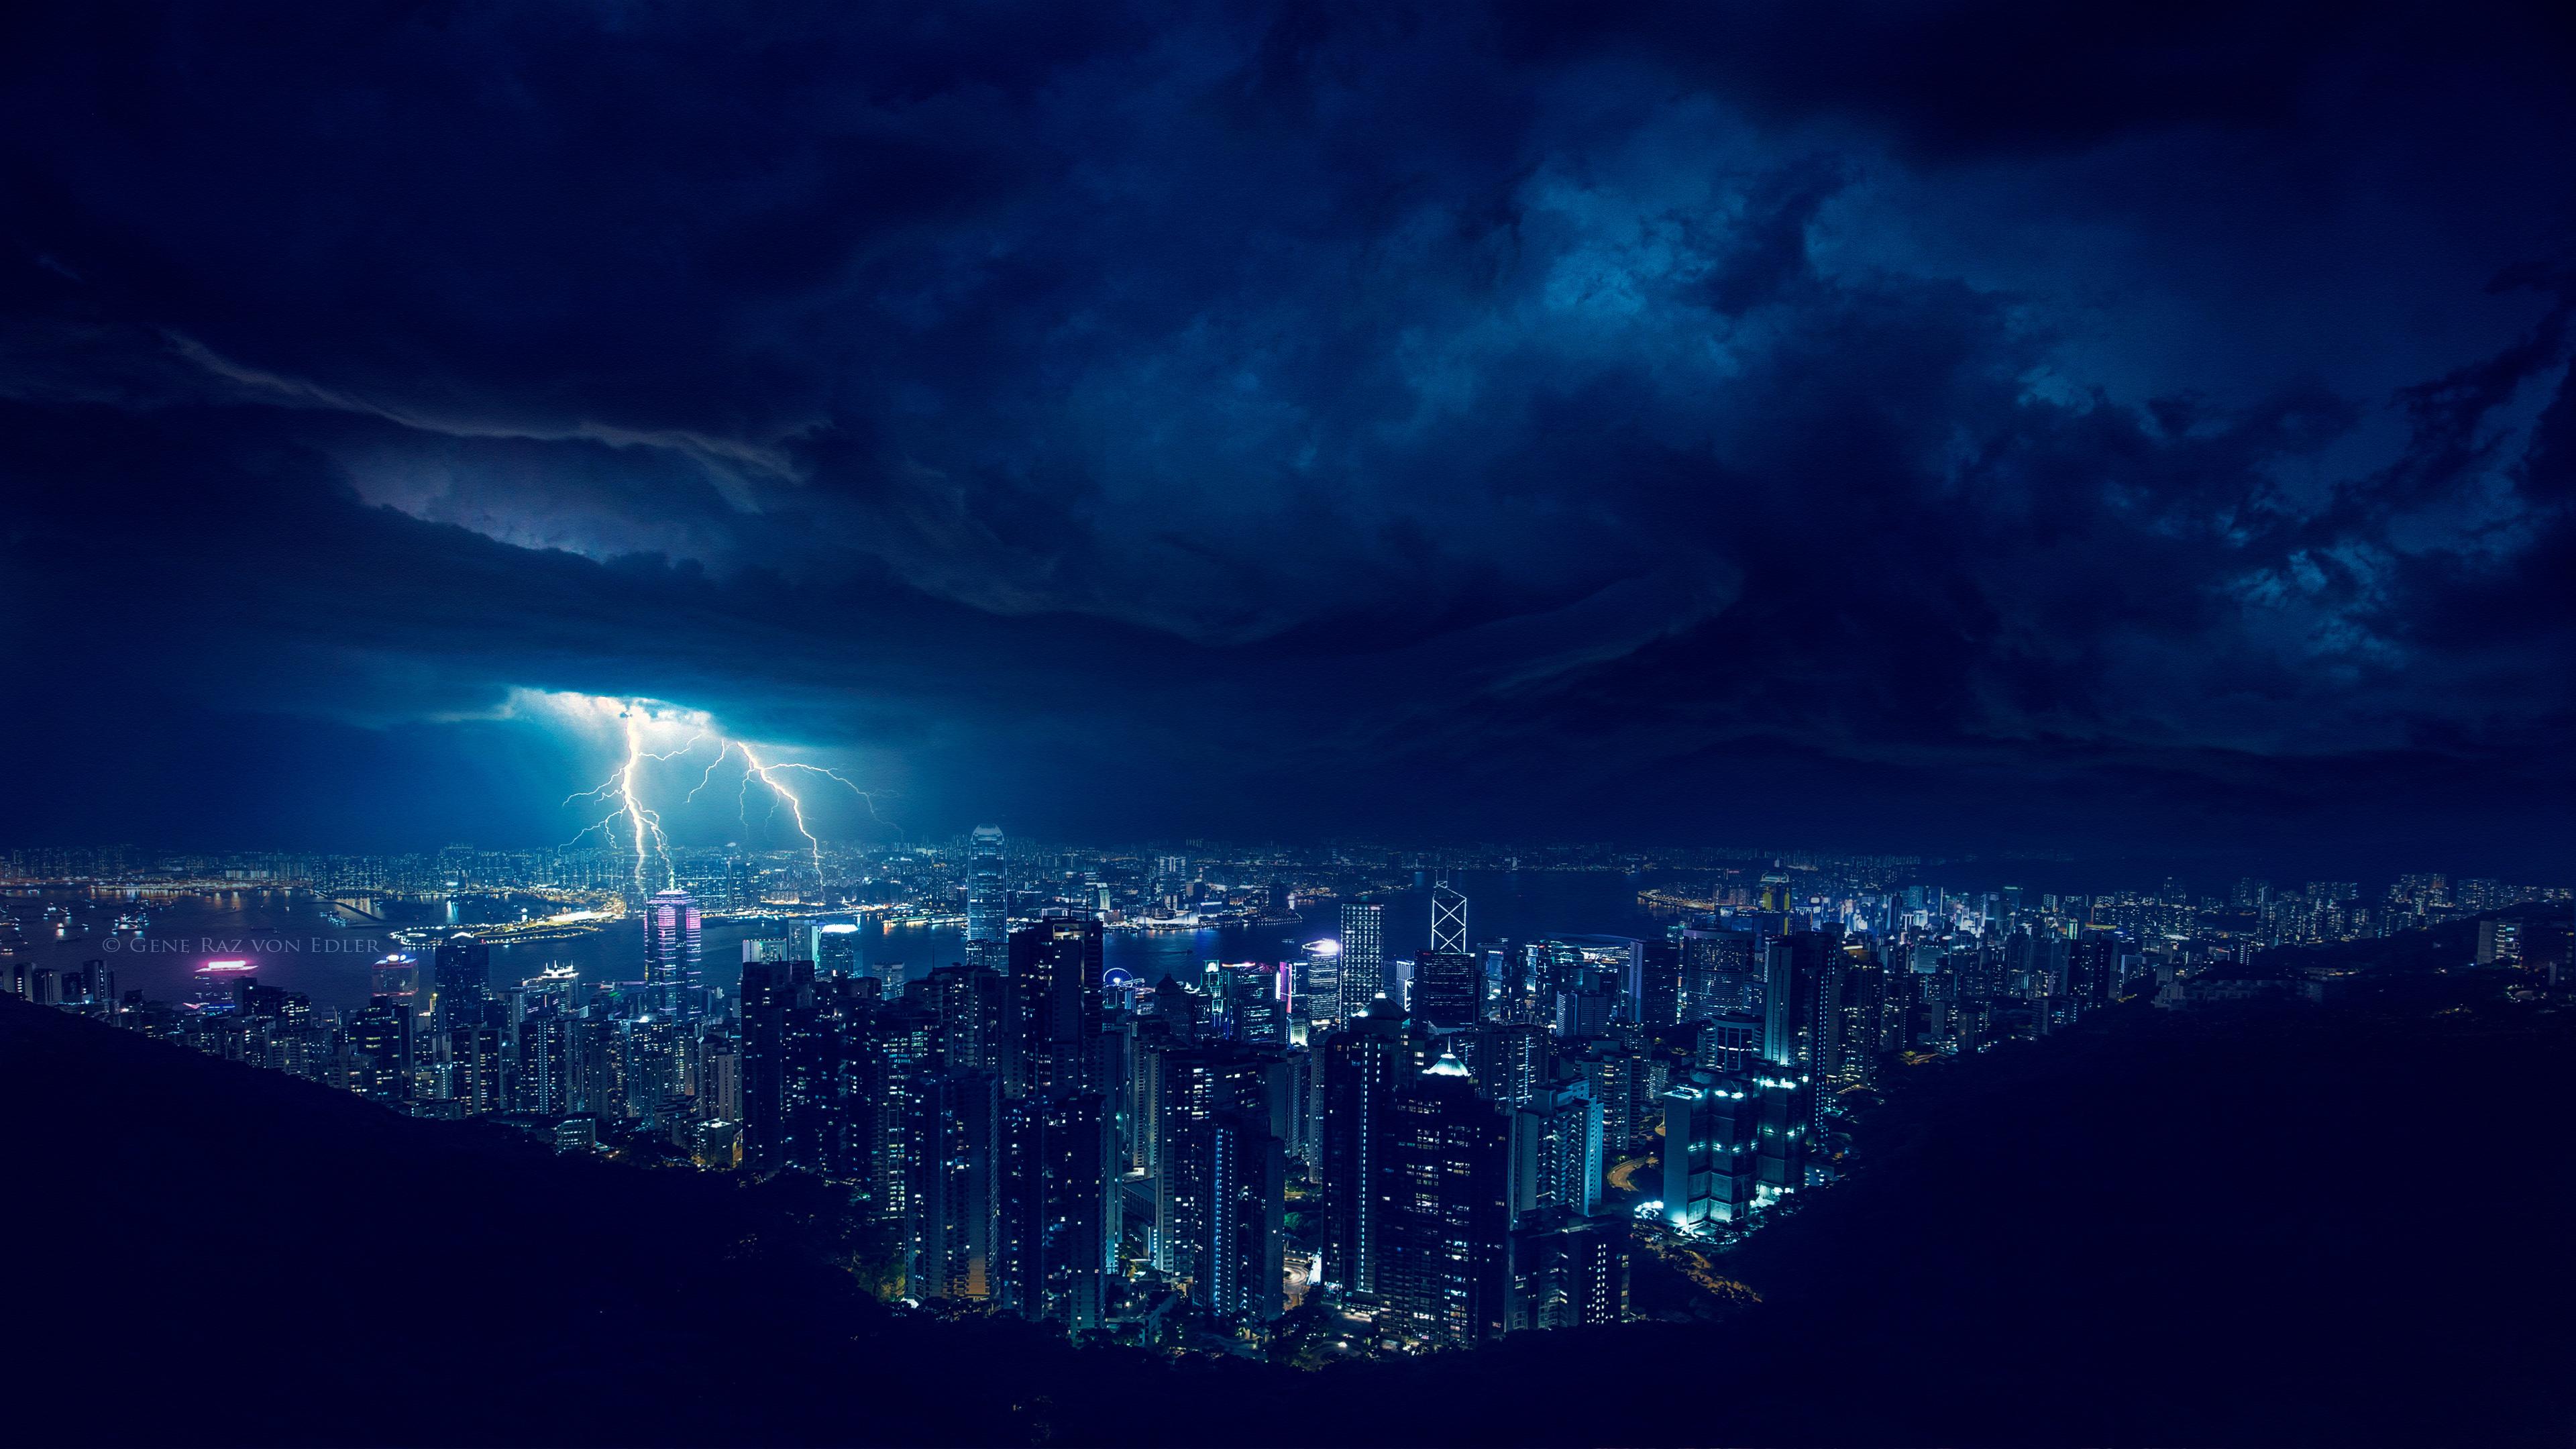 Storm Night Lightning In City 4k Hd Photography 4k